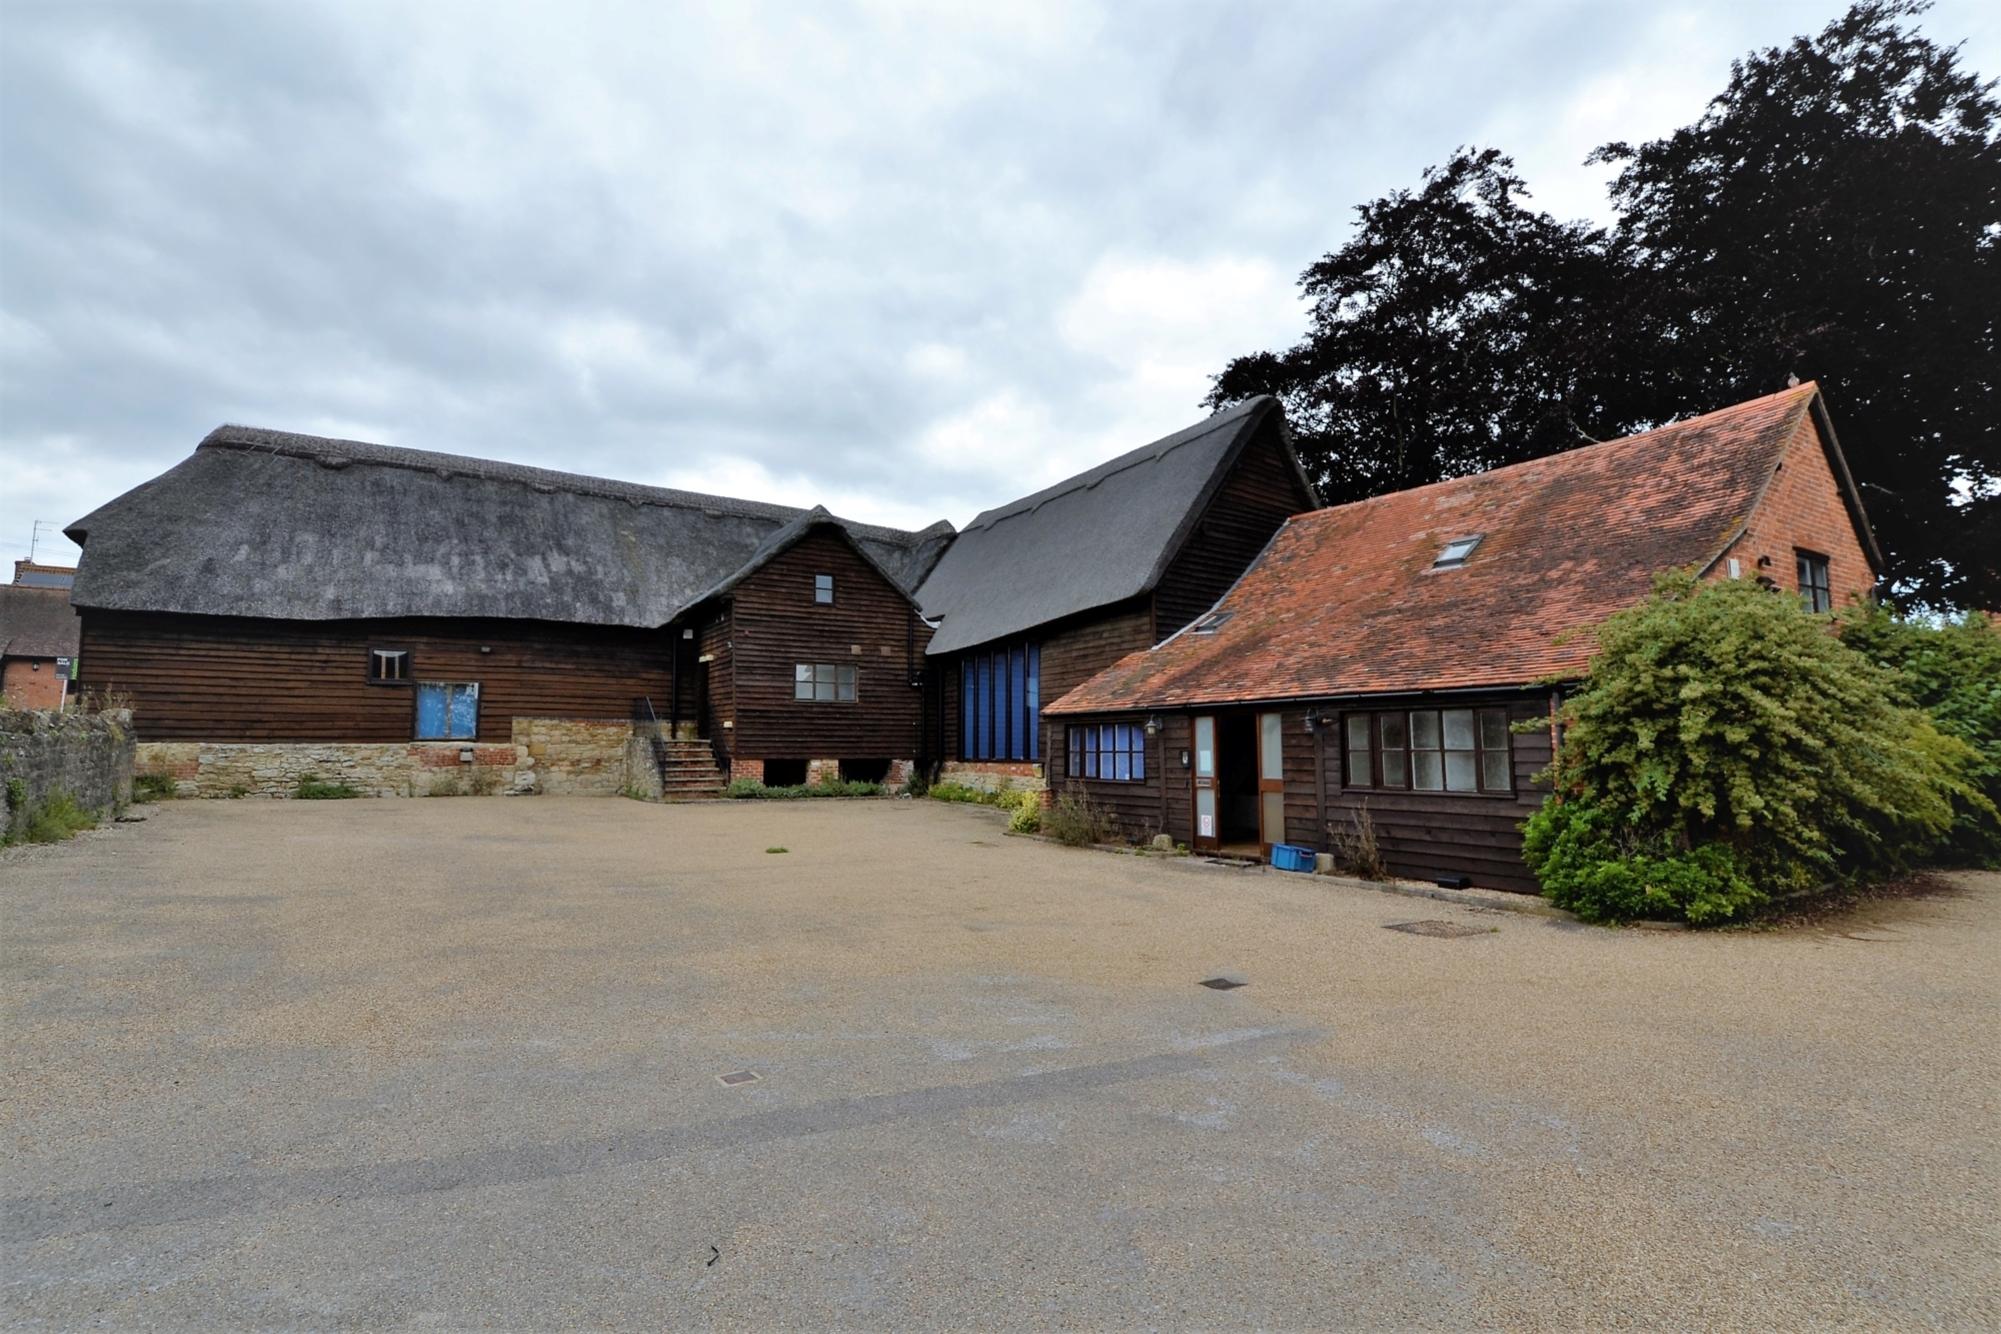 Cherry Barns - Harwell